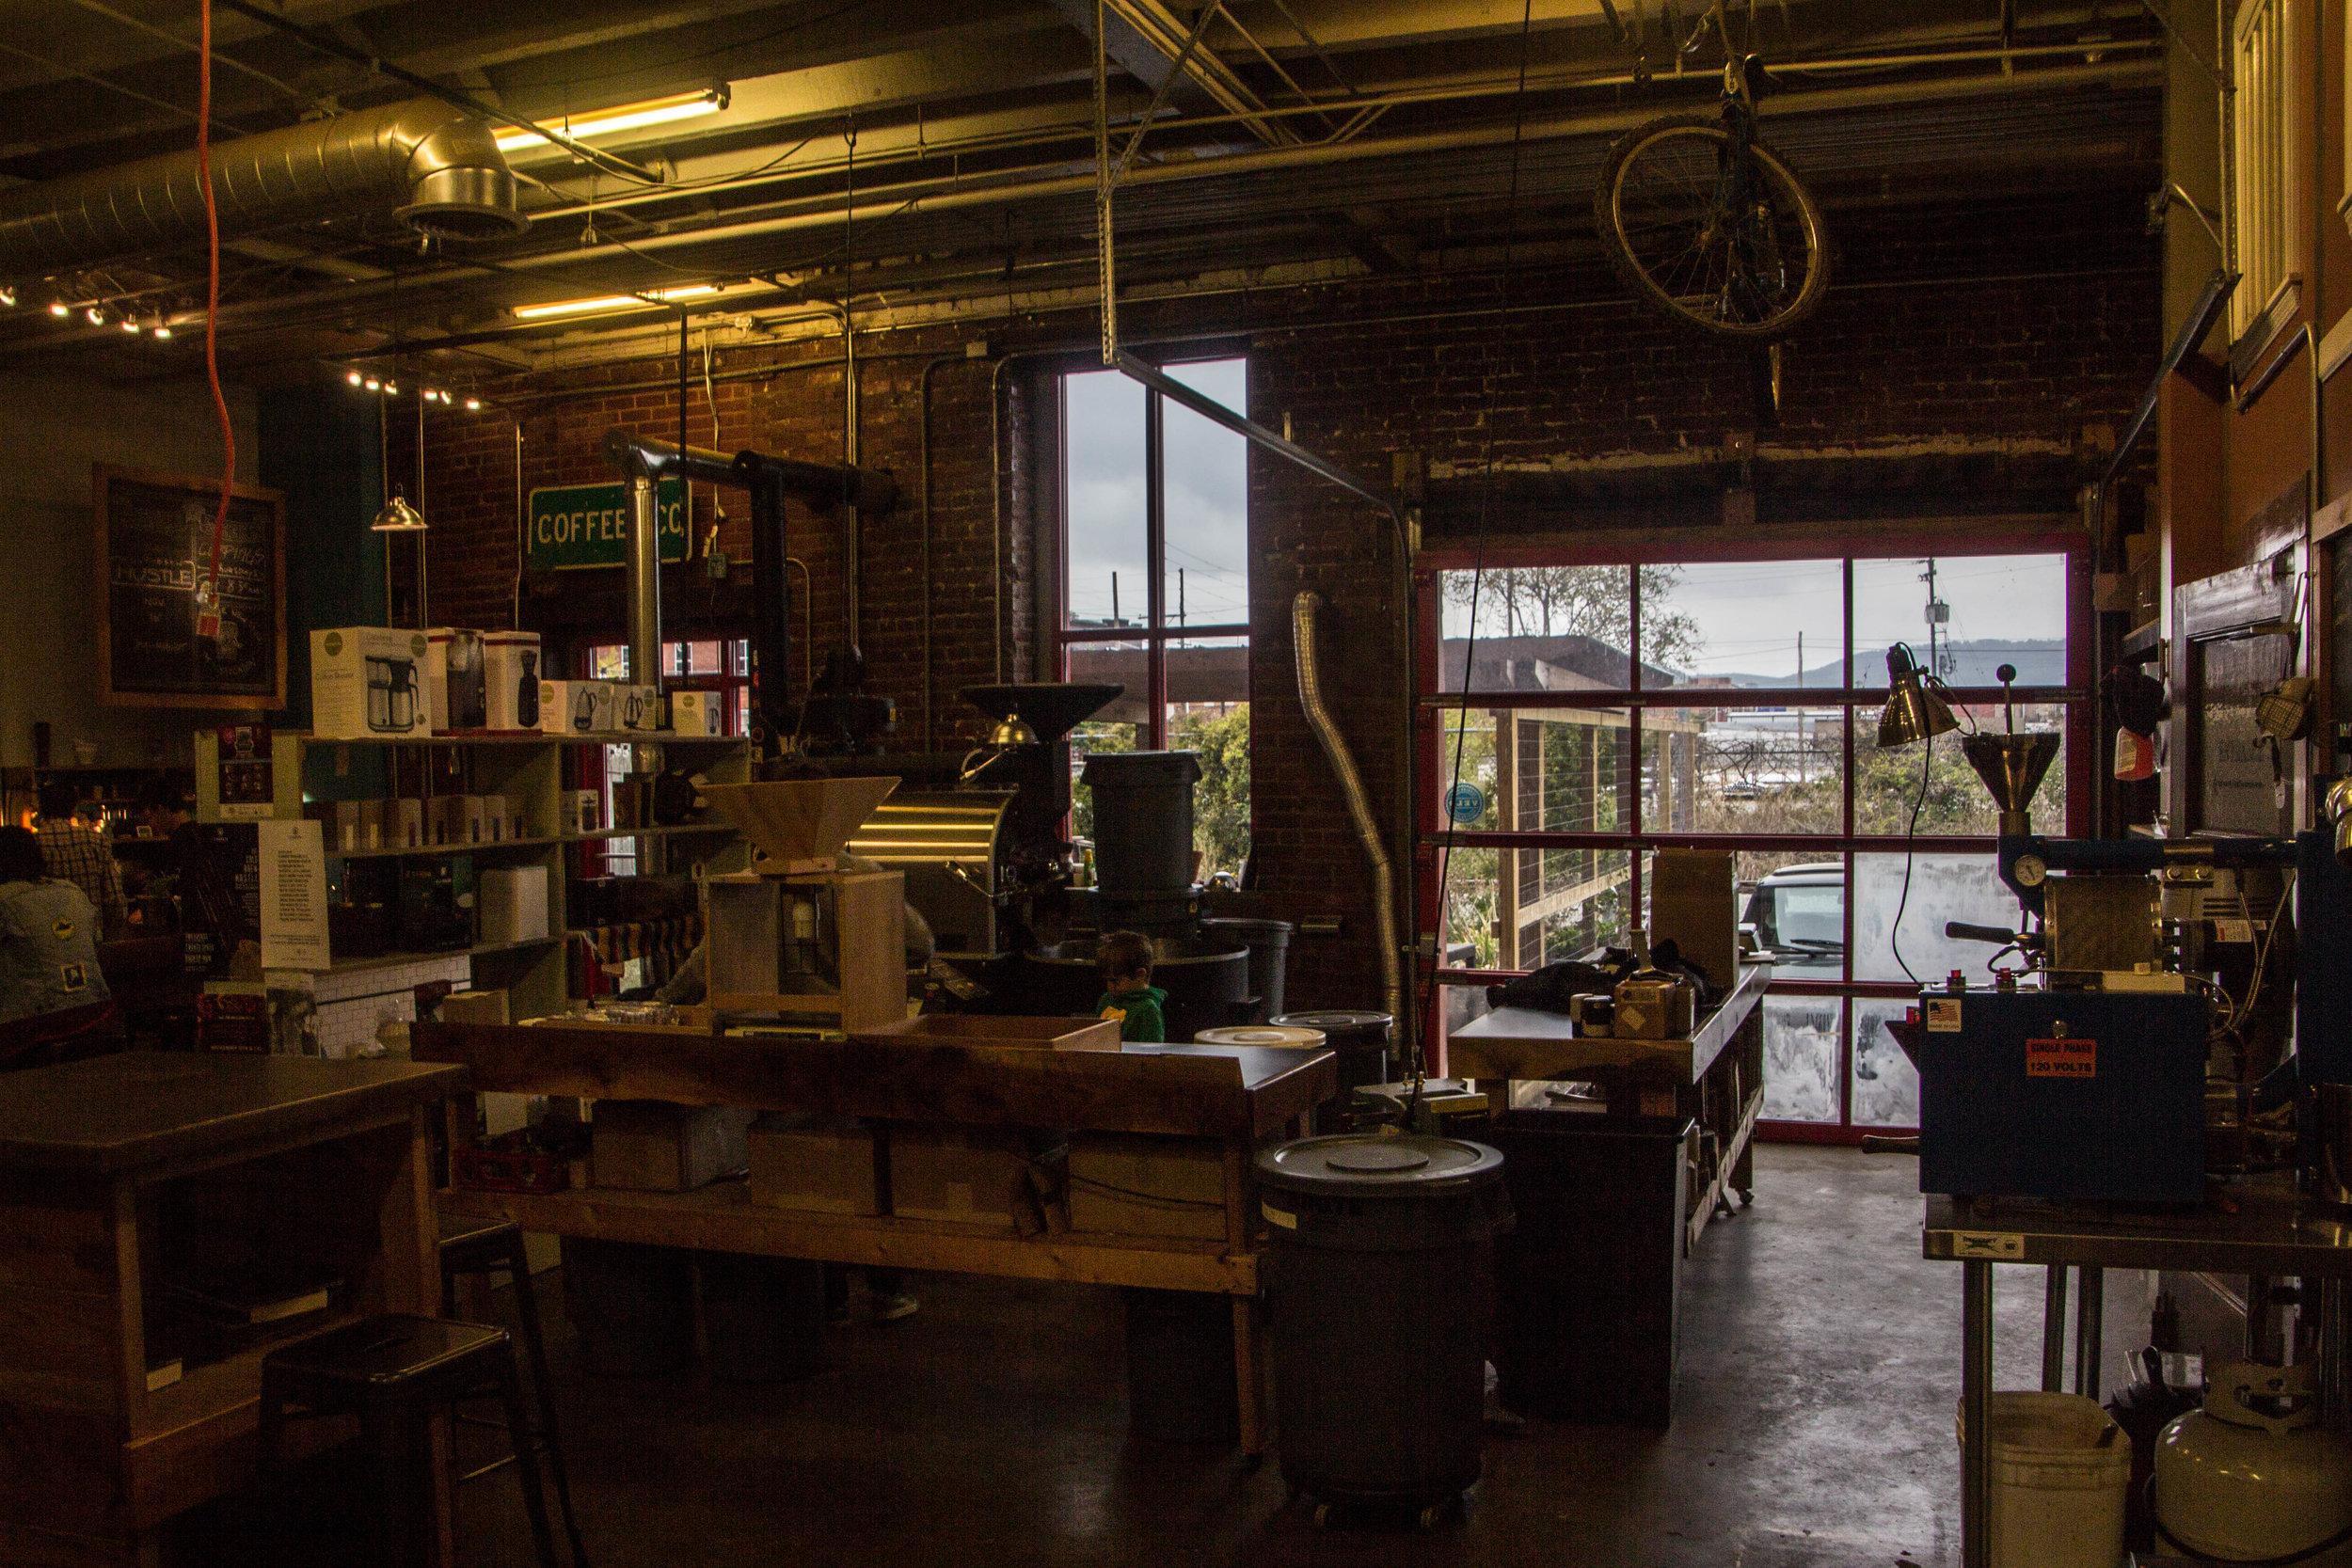 velo-coffee-chattanooga-tennessee-1.jpg